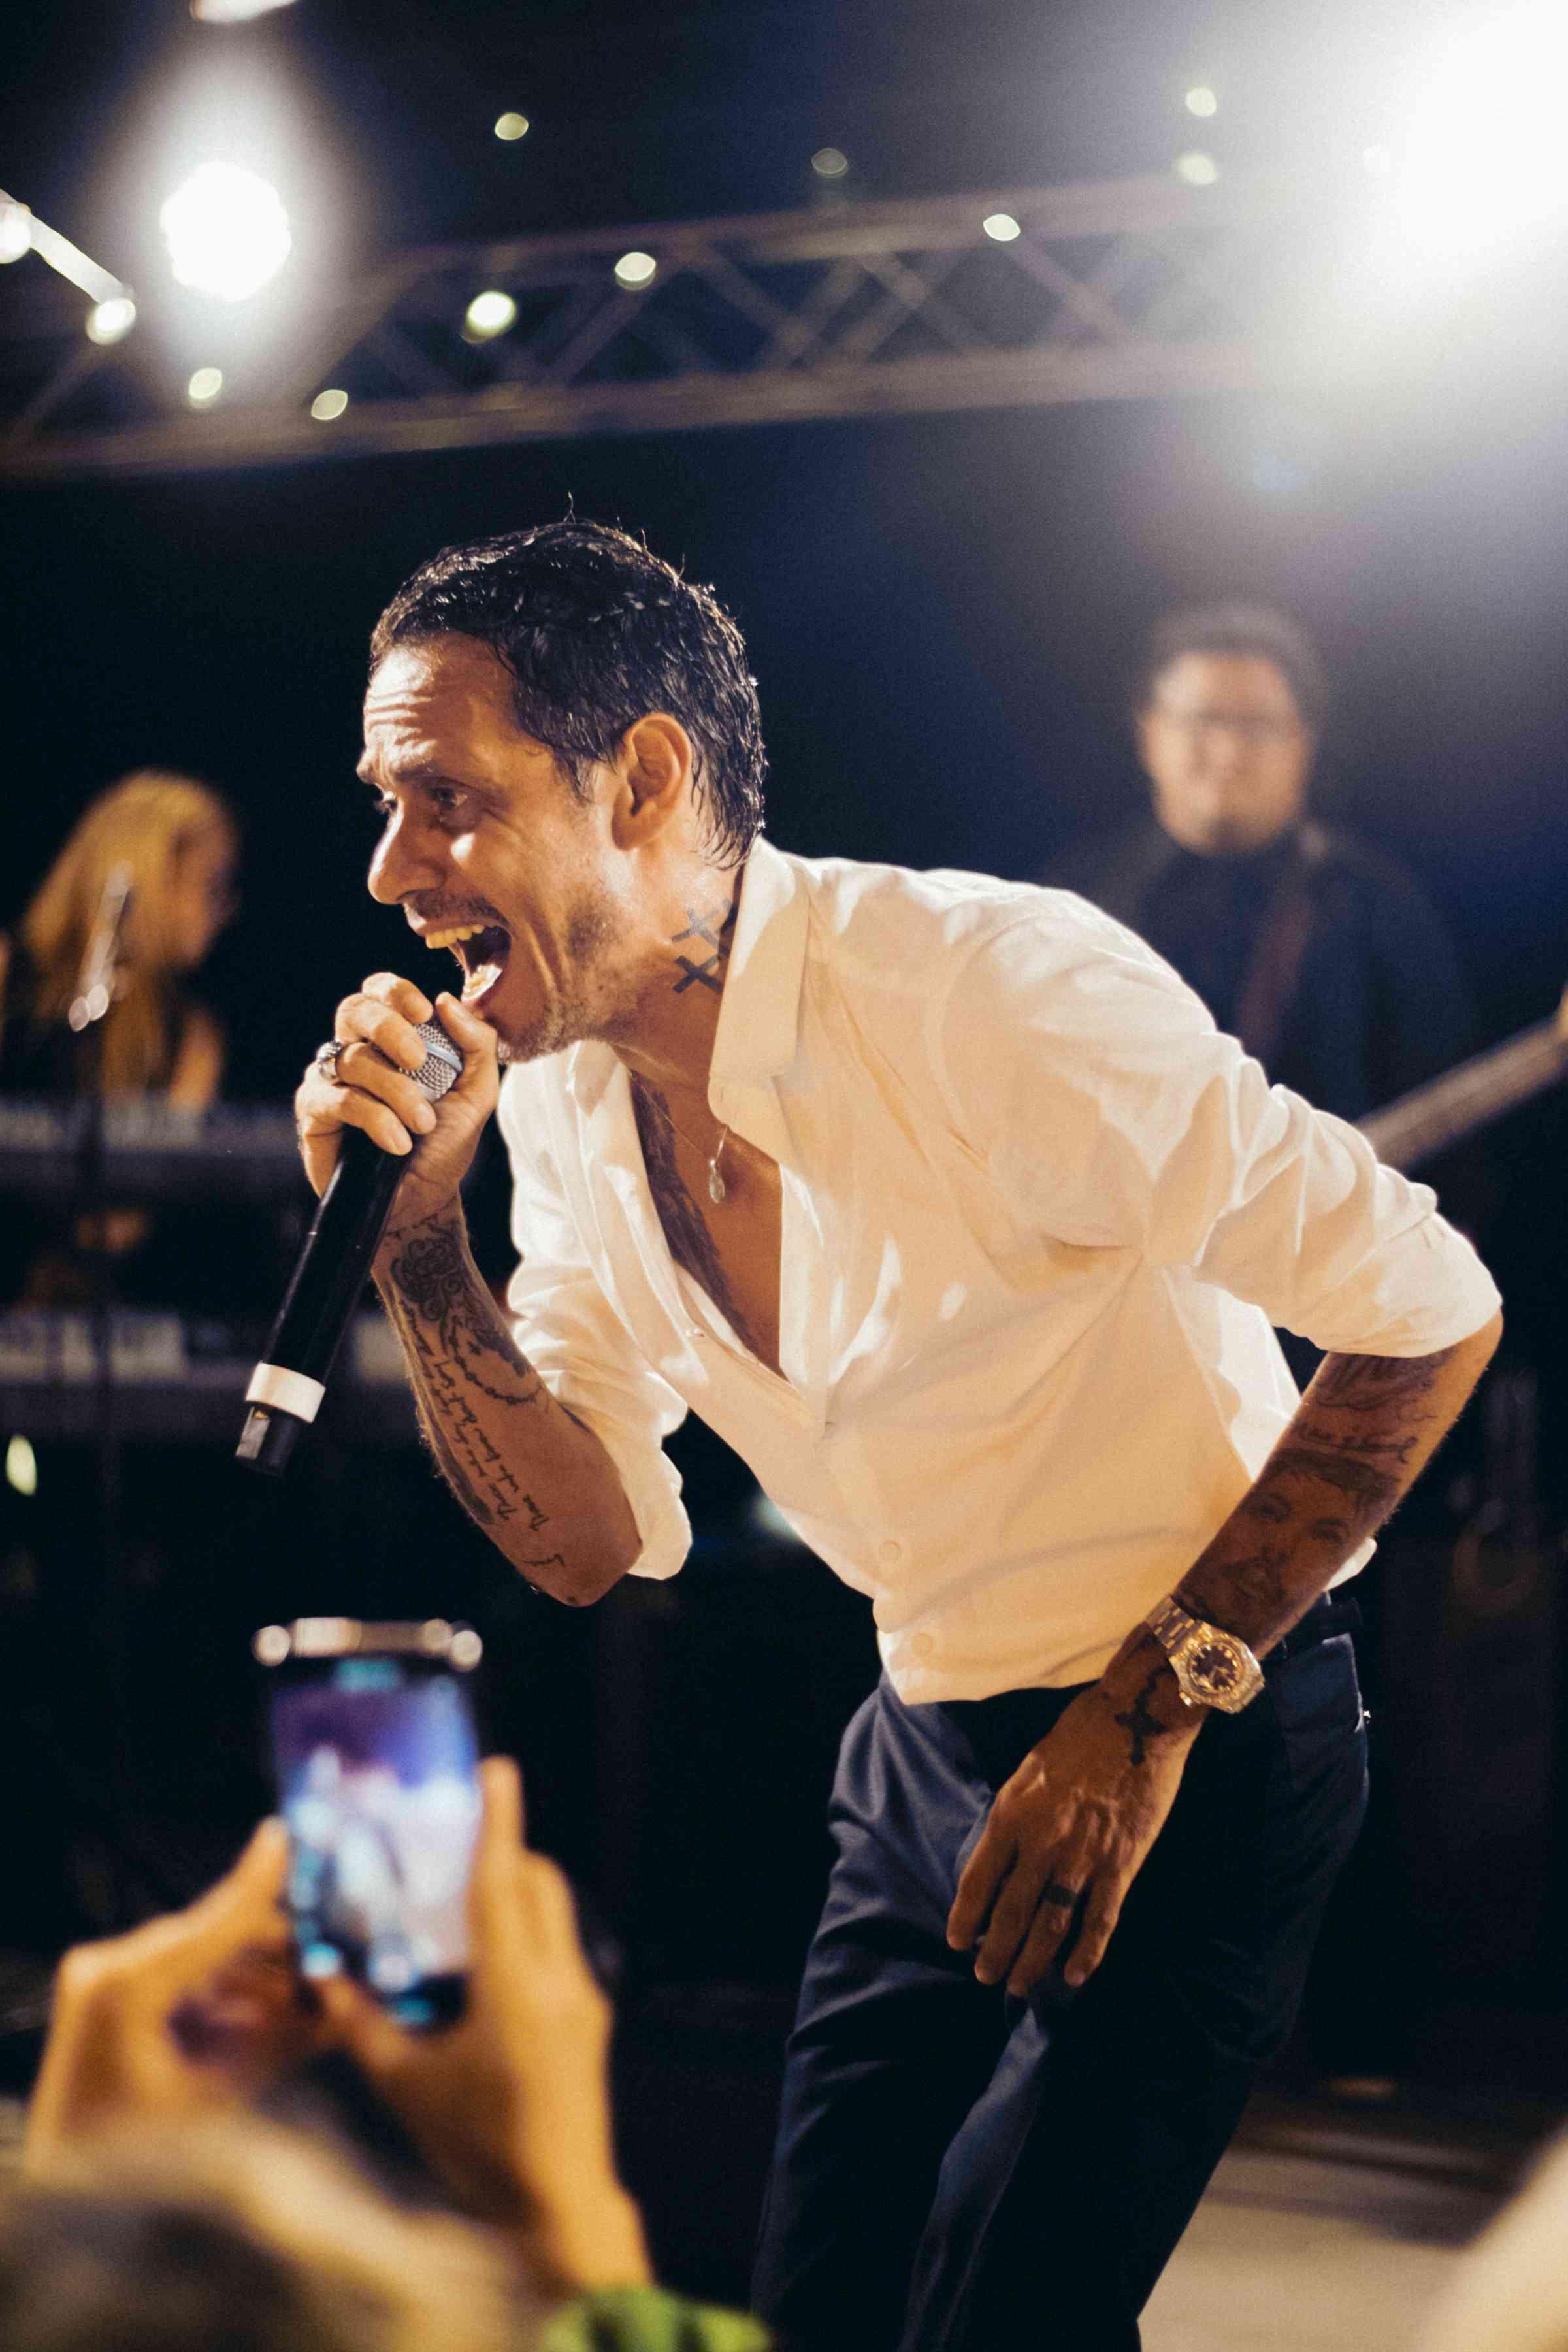 Marc Anthony singing at reception